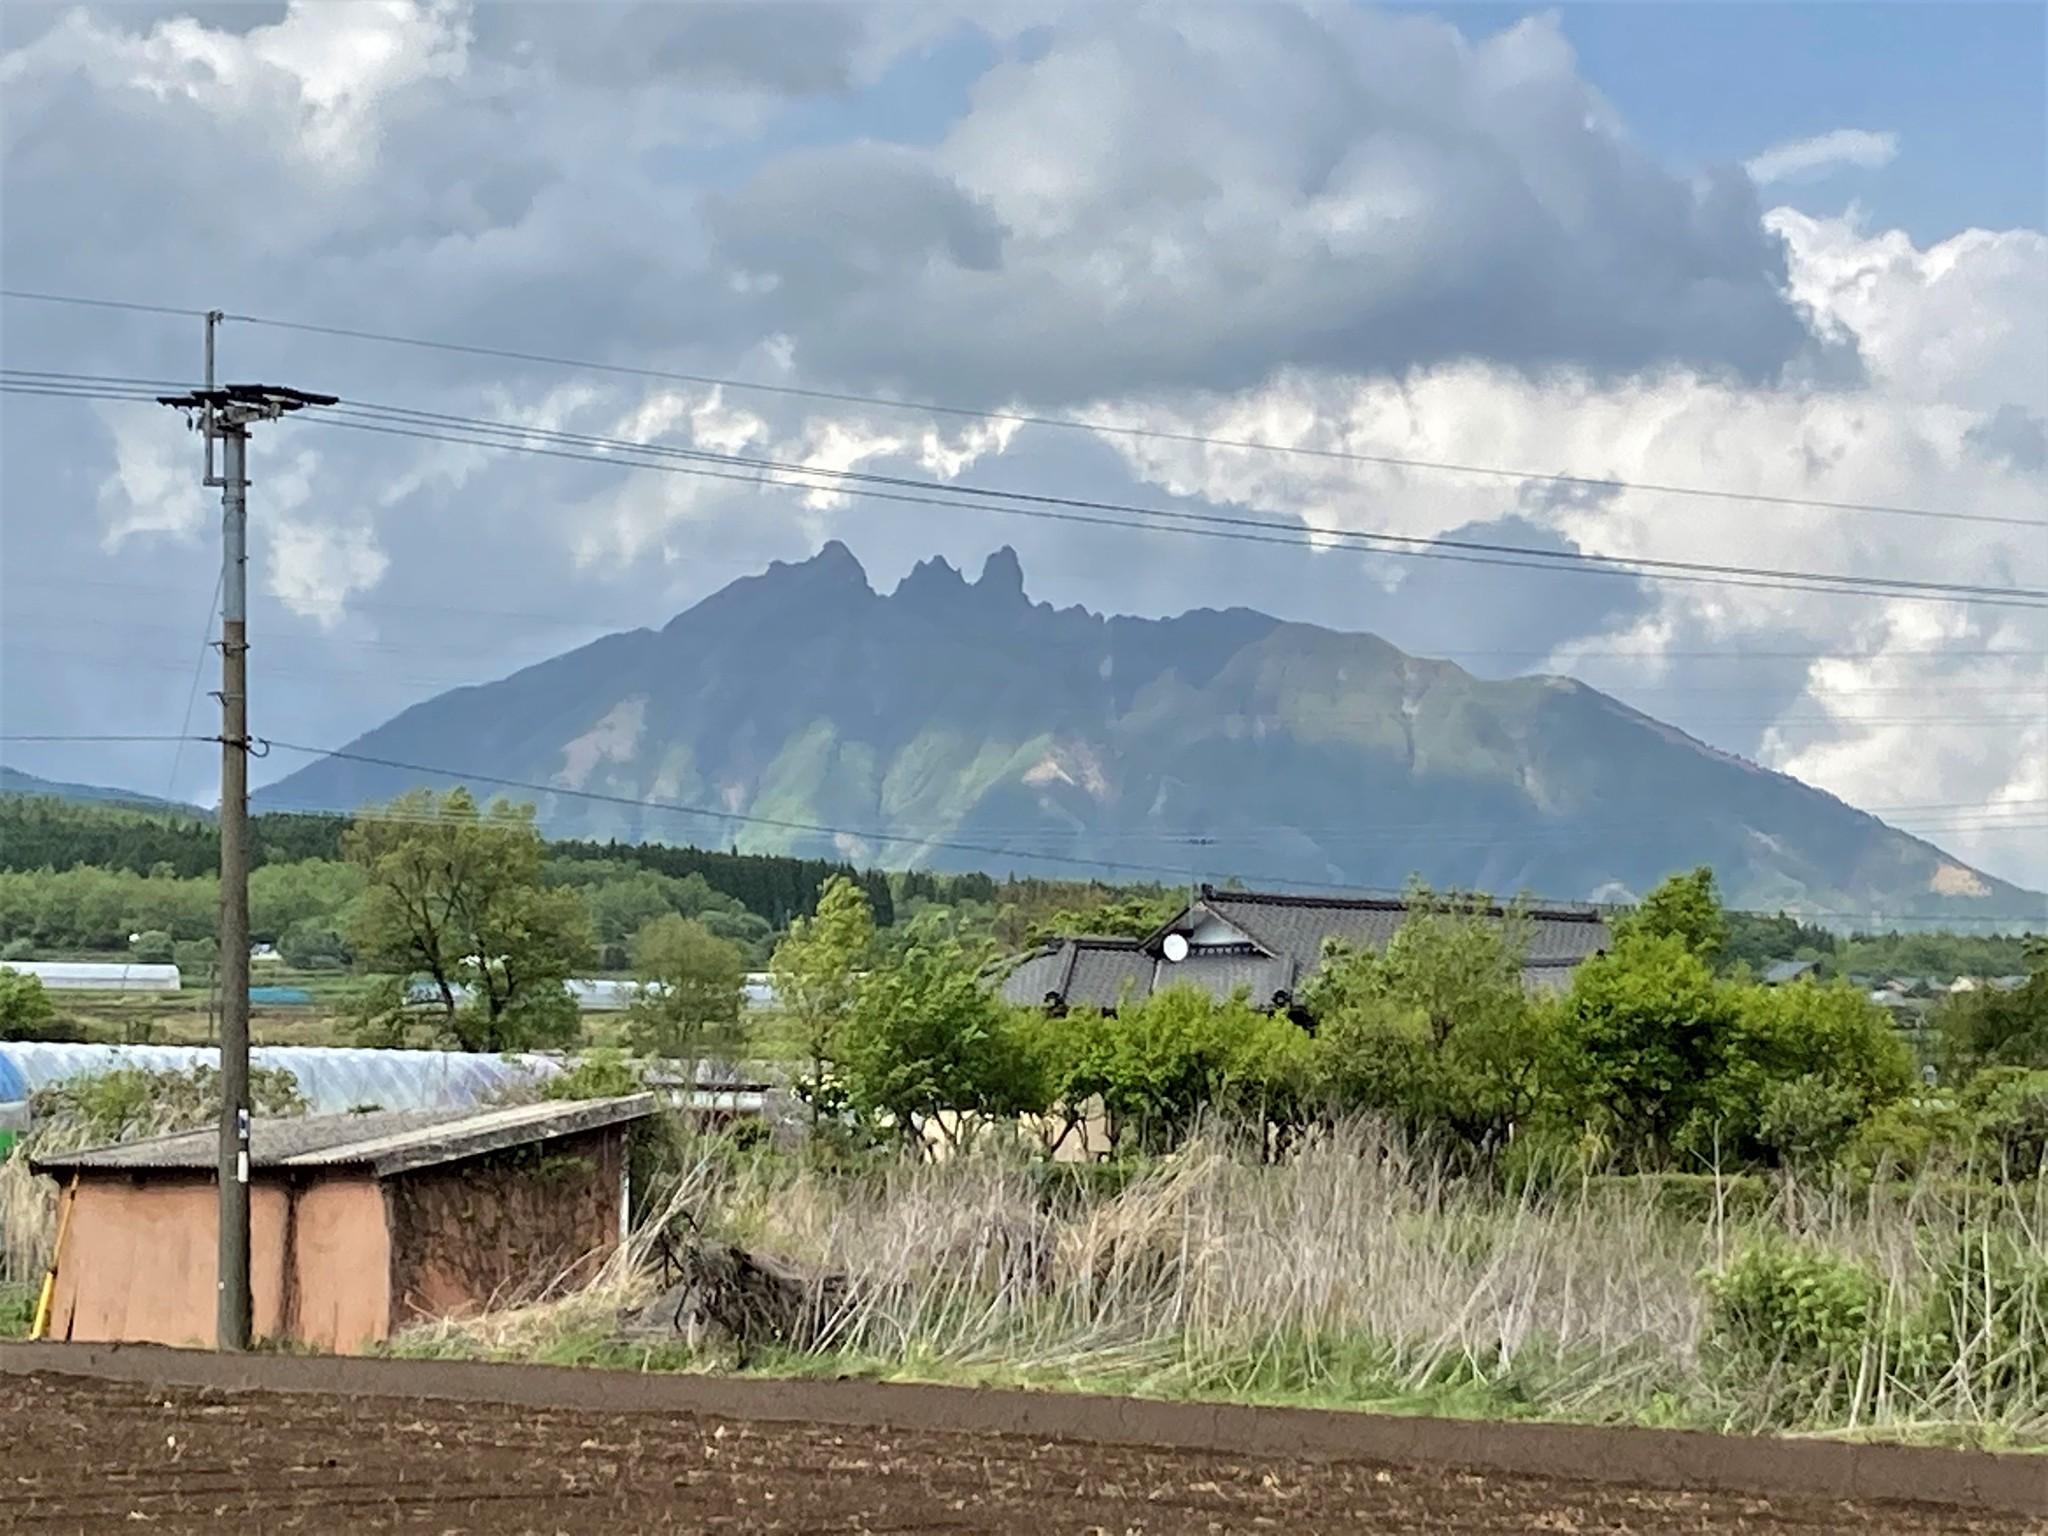 A rugged volcanic peak rising above farmland in Aso, Kyushu.